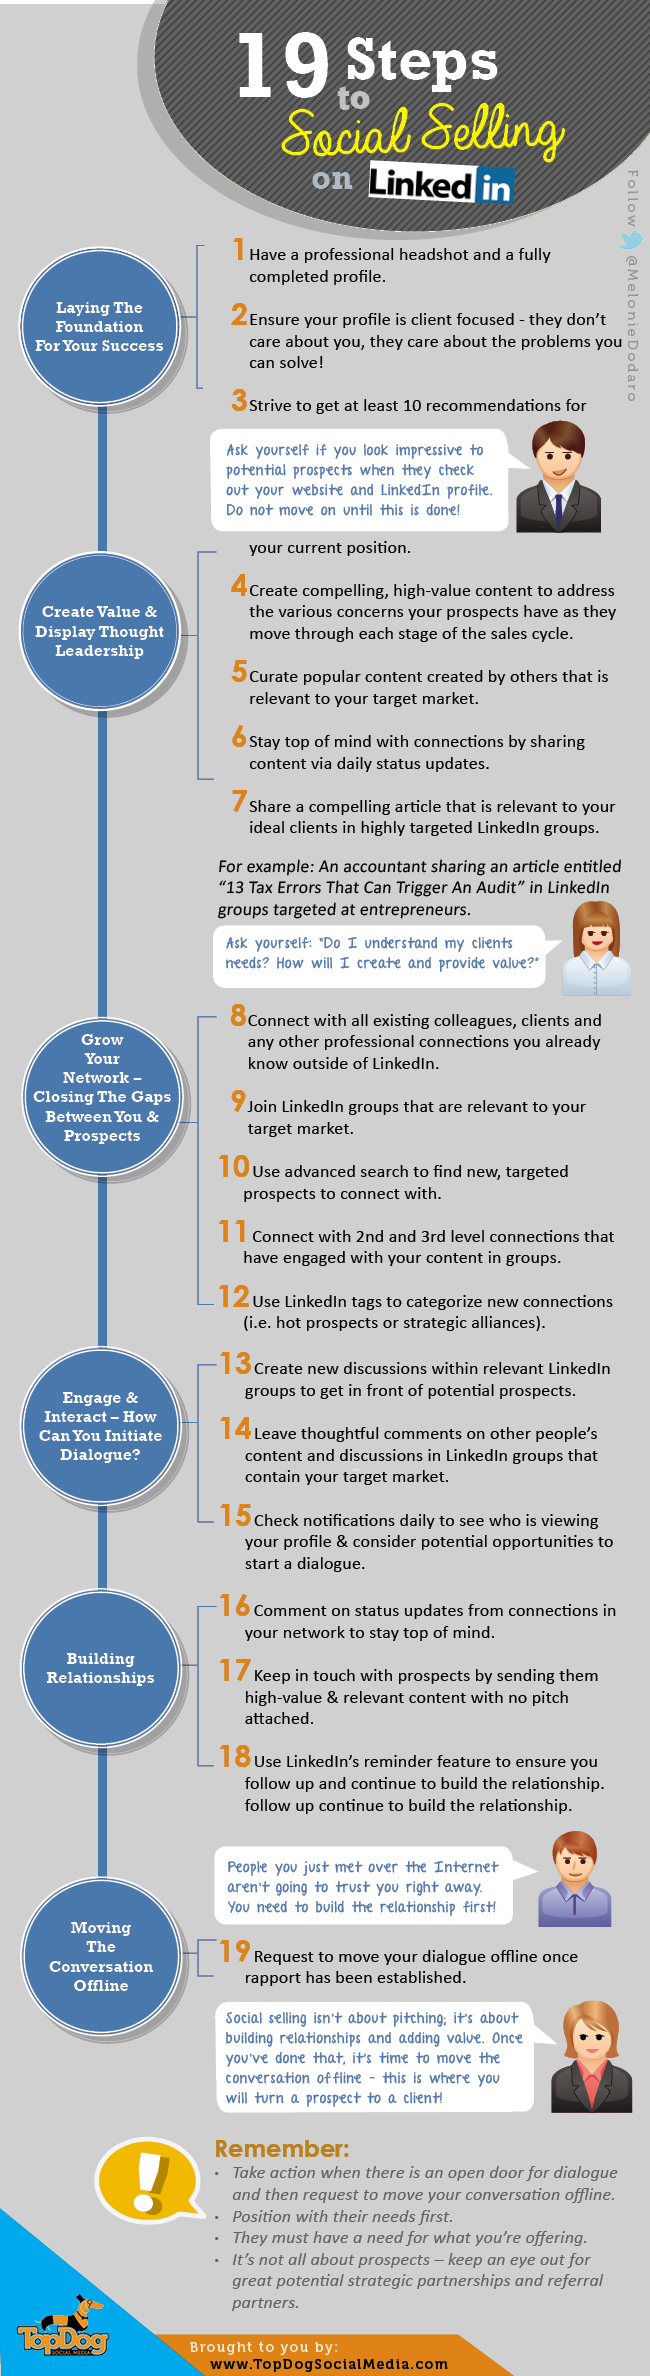 19 pasos para Social Selling en Linkedin